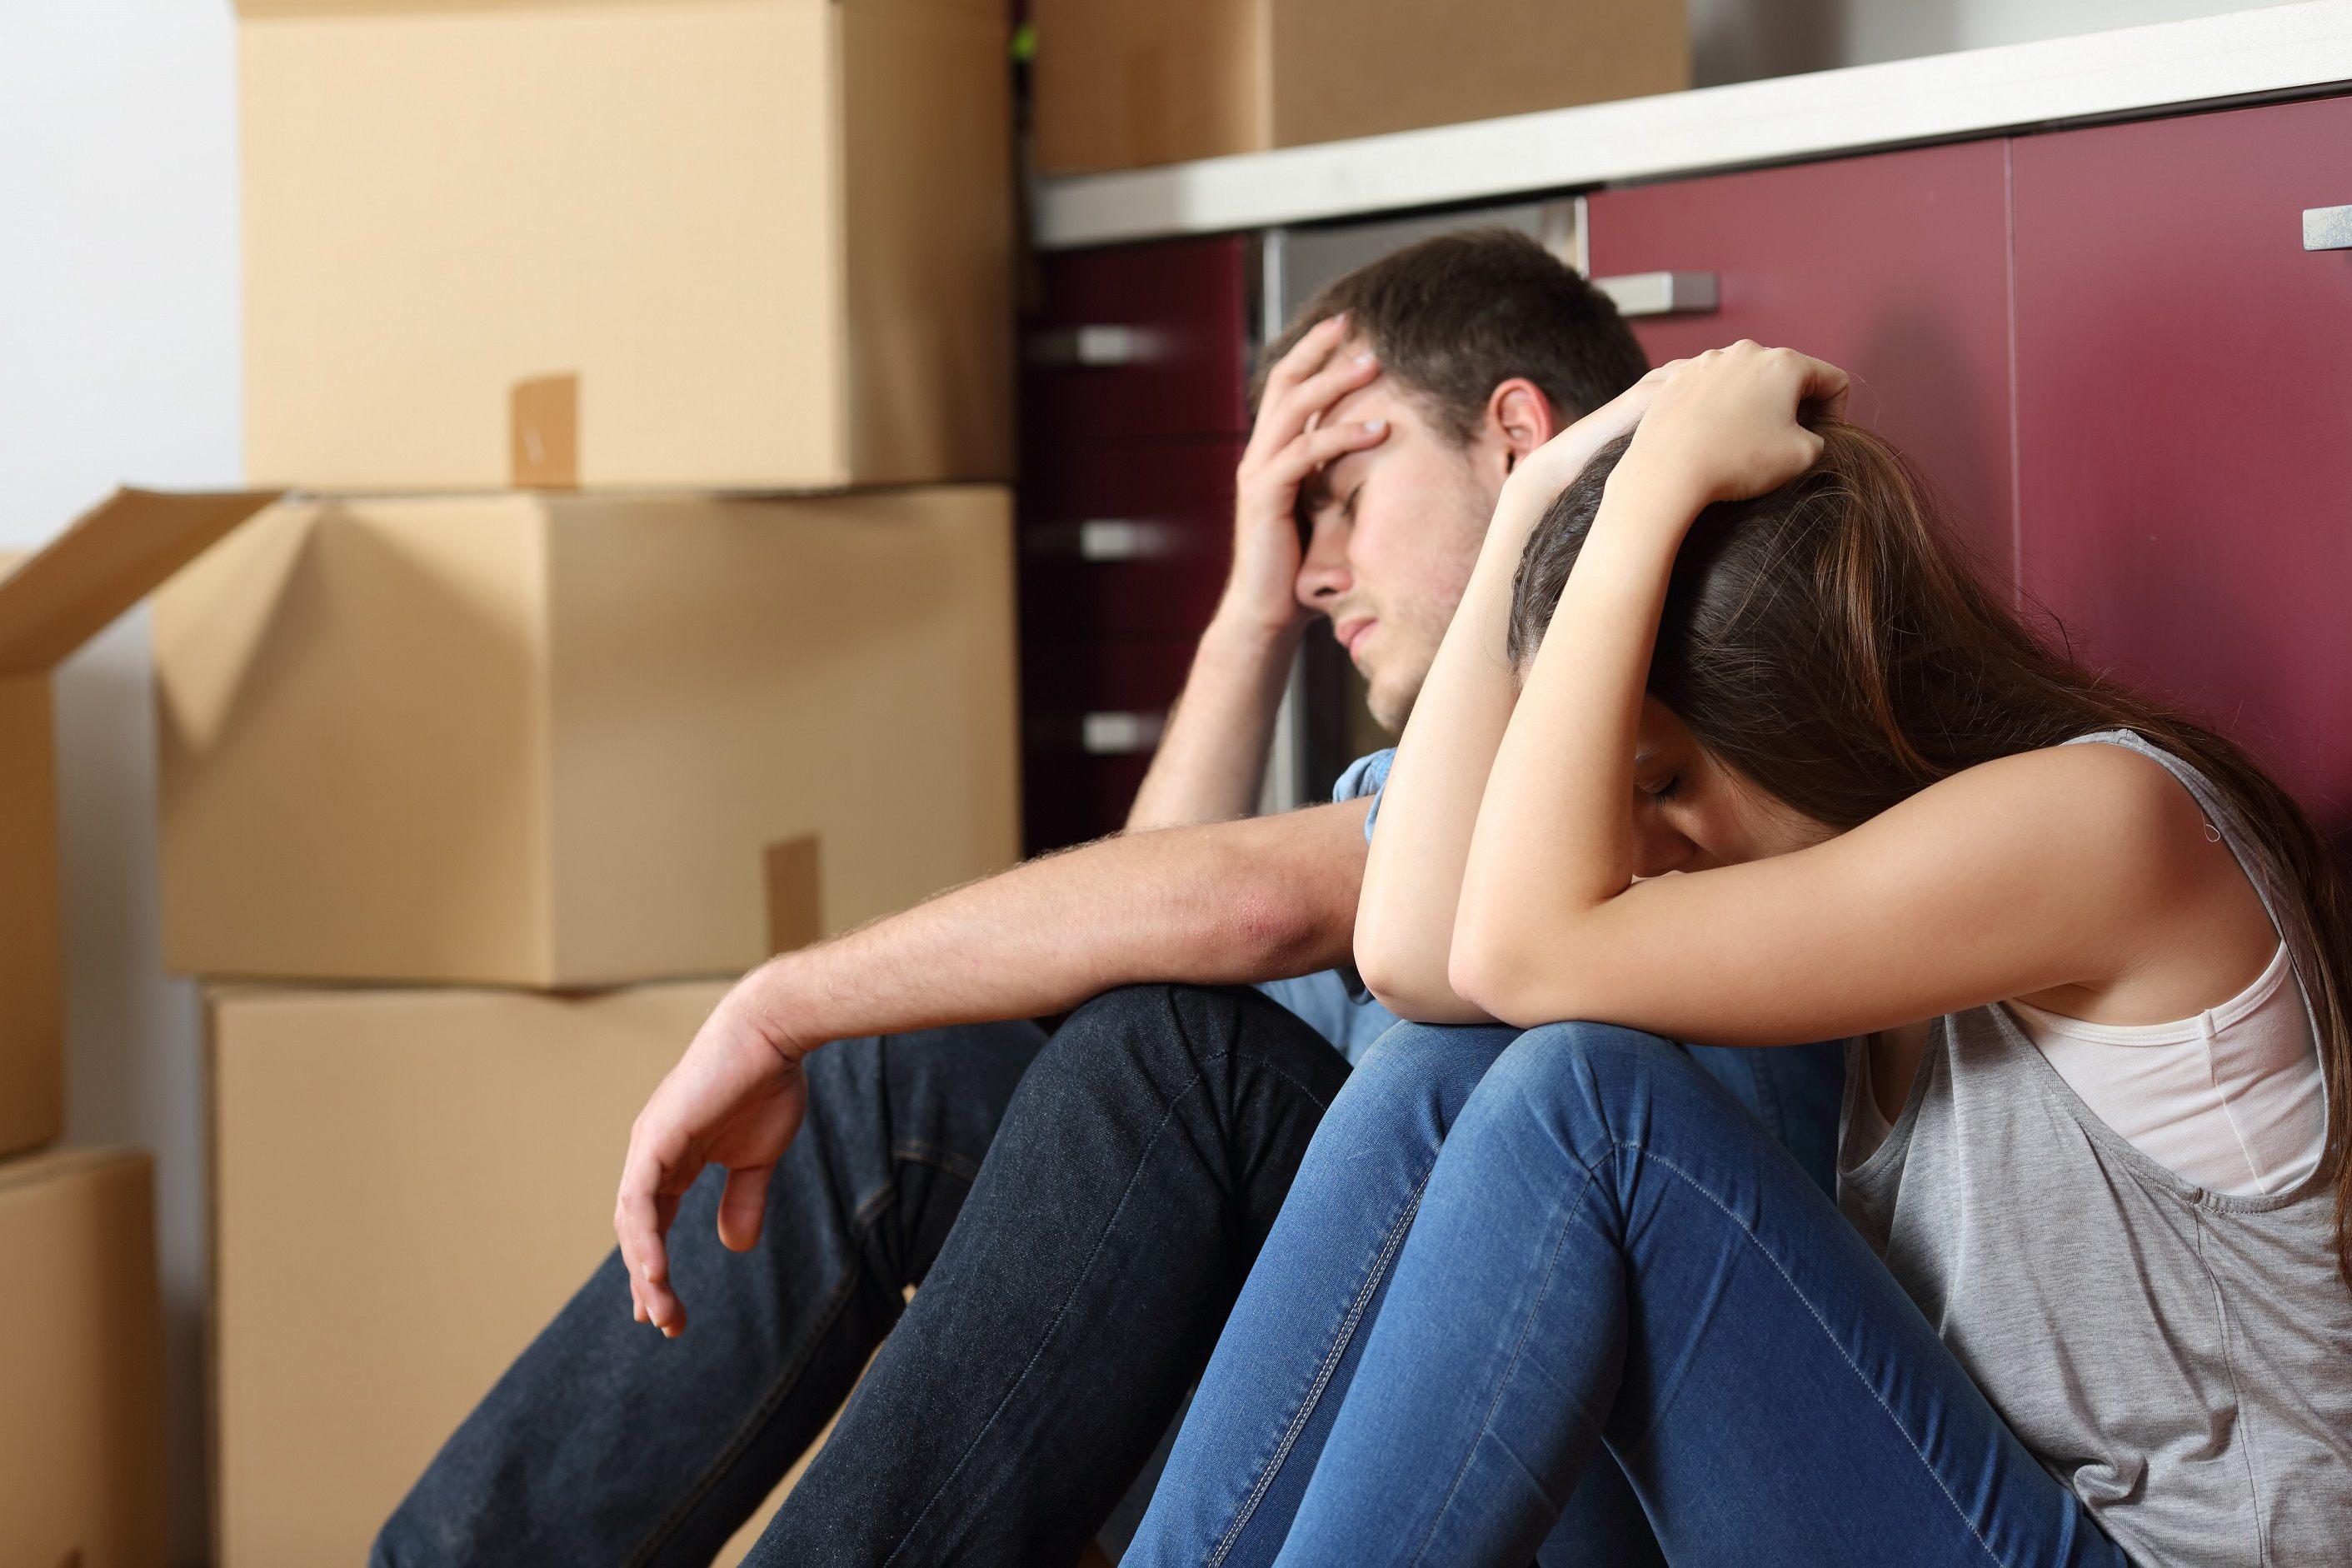 Couple sitting on the floor looking upset